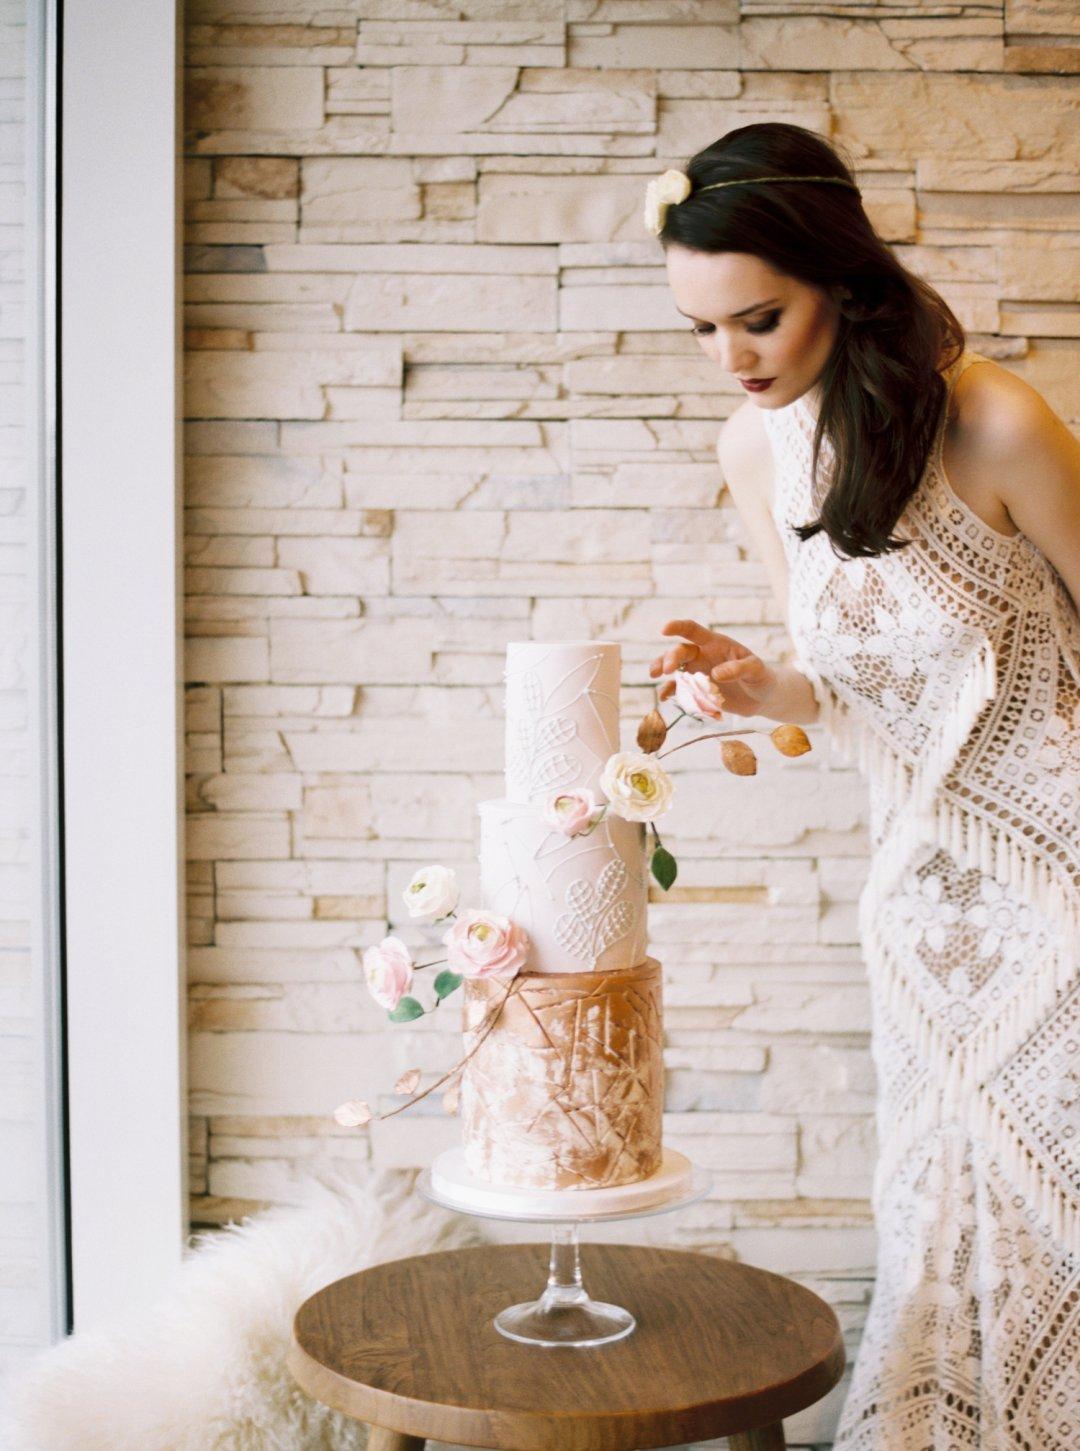 Bride in boho style wedding dress standing next to three tier cream wedding cake